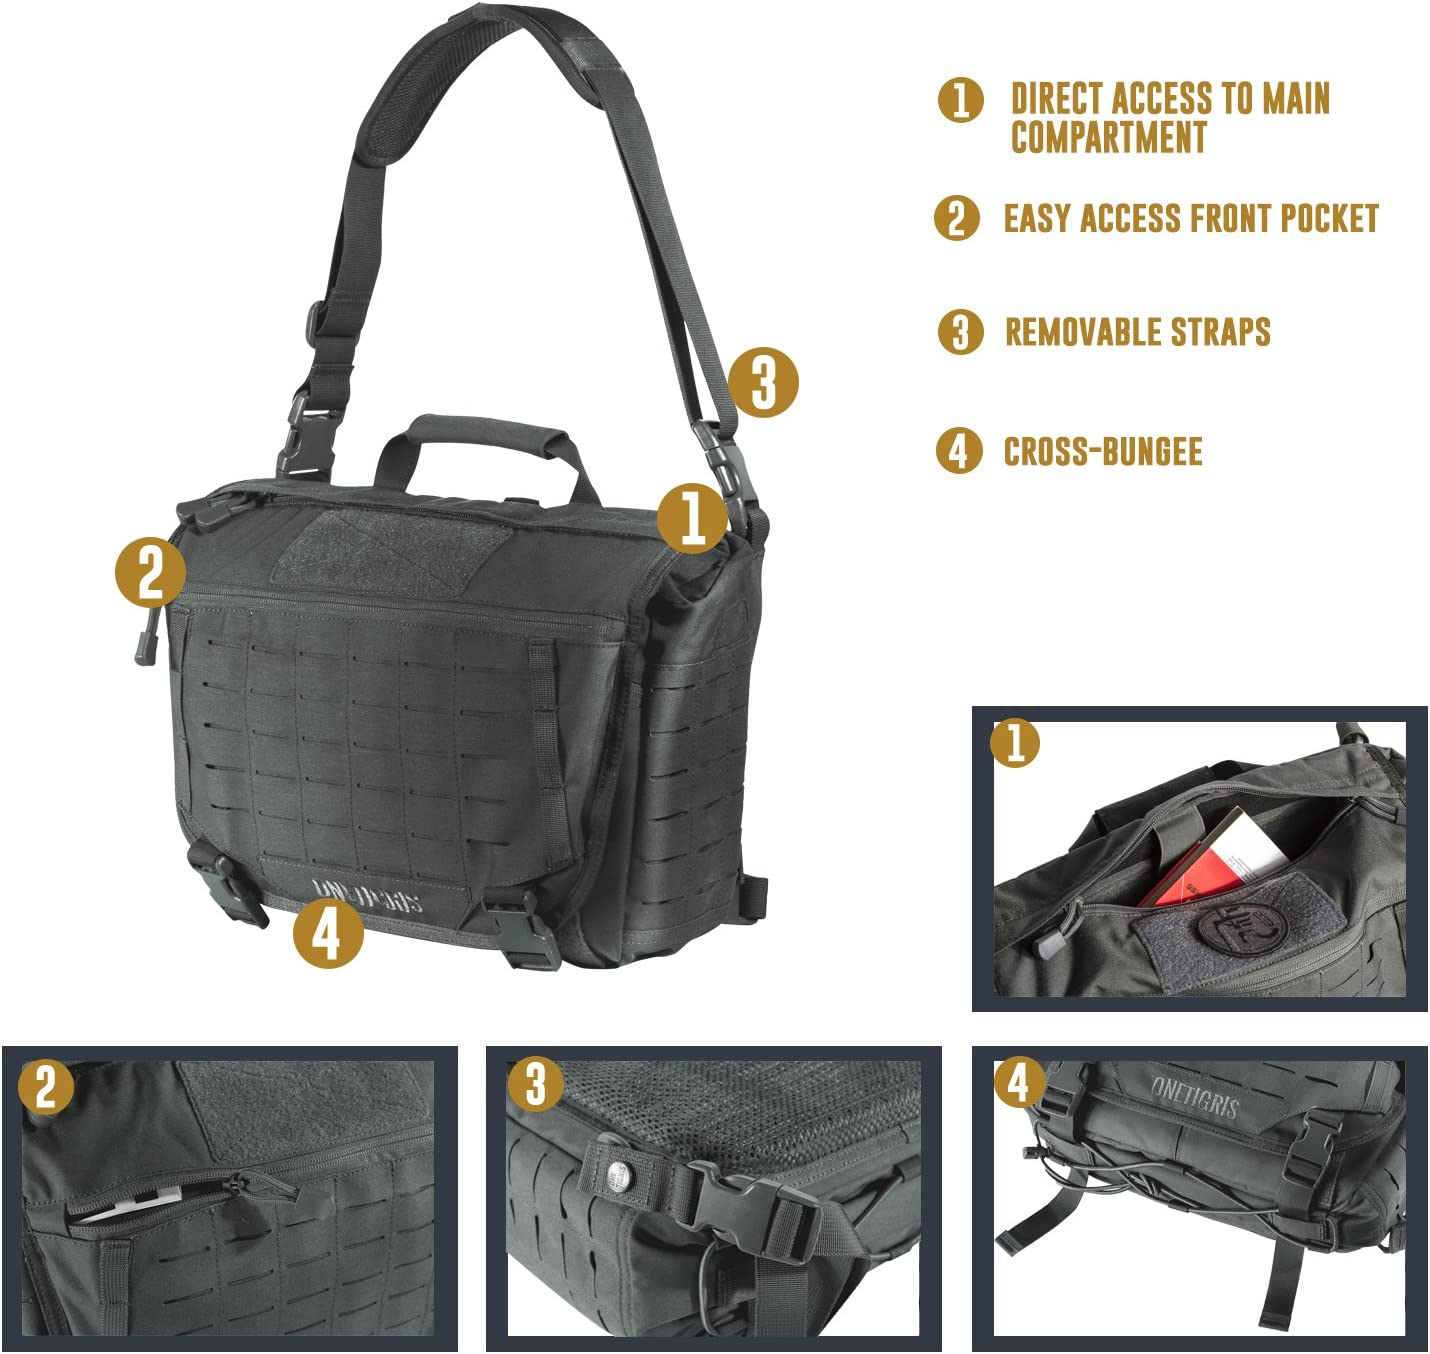 Schatten Grau OneTigris Umh/ängetasche Taktische Molle Schultertasche Kompakte Kuriertasche Messenger Bag mit Schultergurt